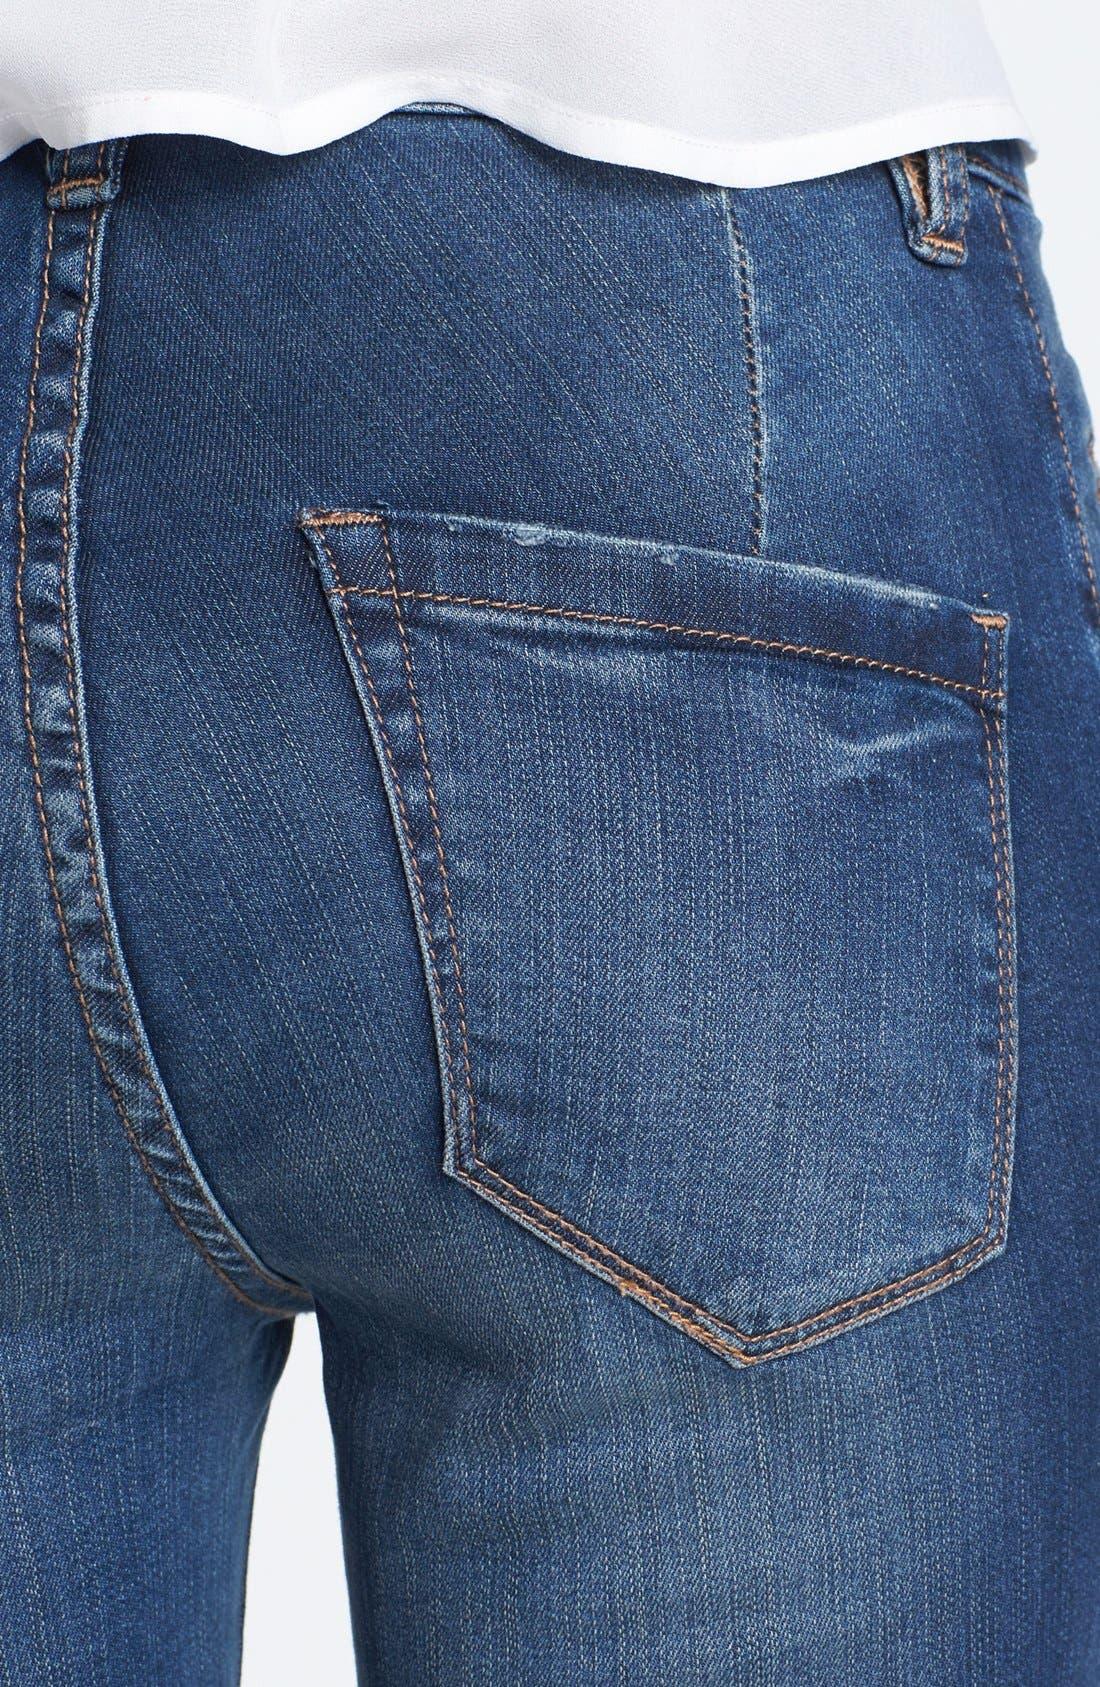 Alternate Image 3  - BLANKNYC 'Short Stack' Flare Leg Jeans